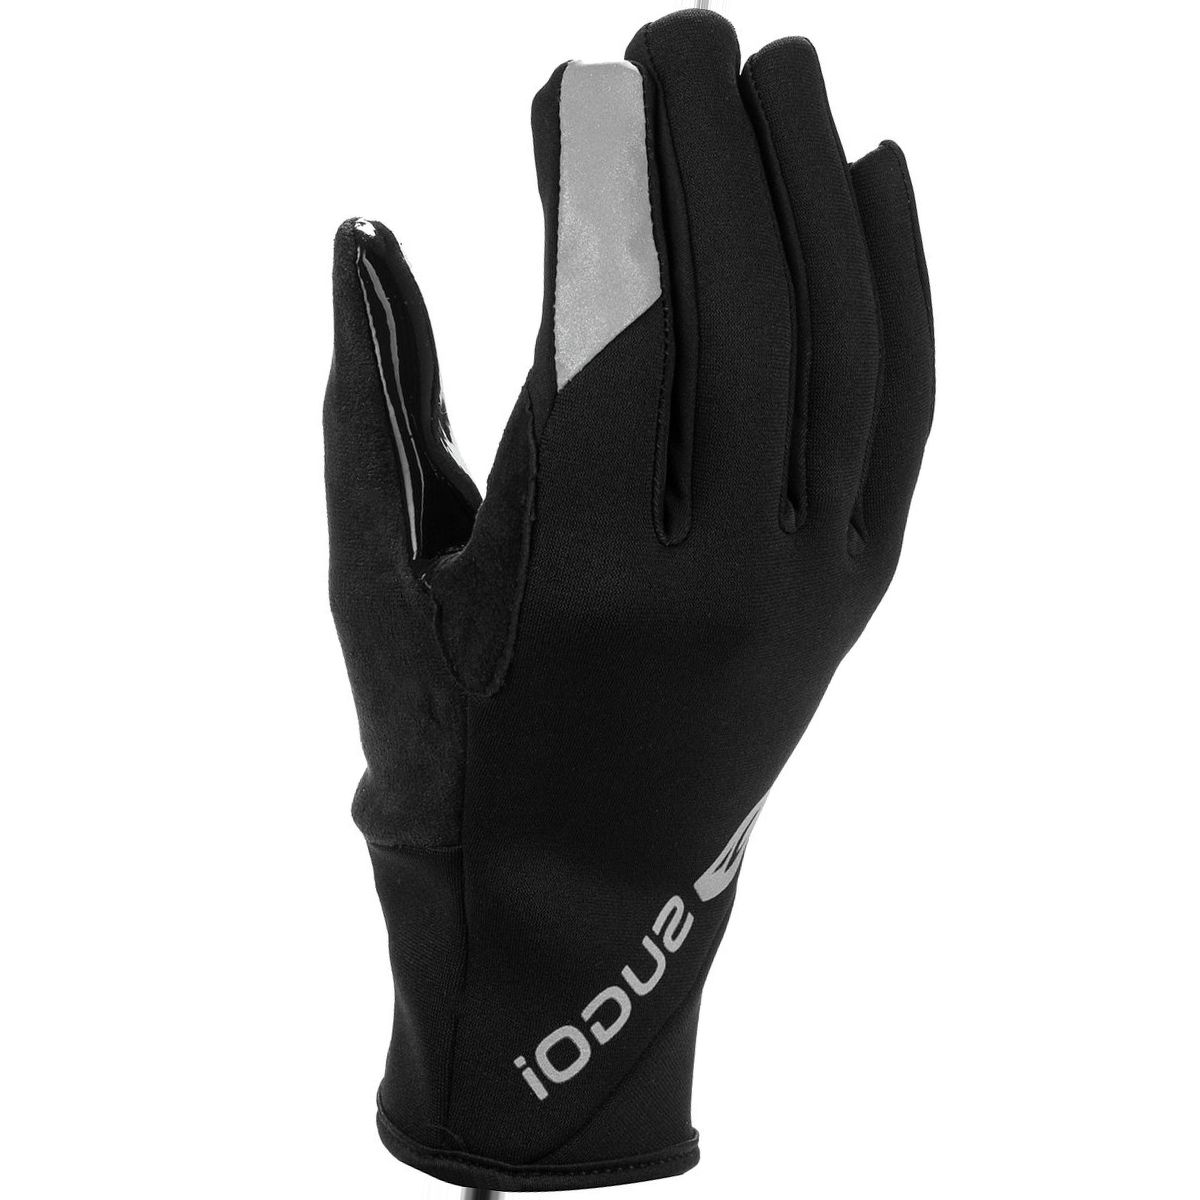 SUGOi Resistor Glove - Men's